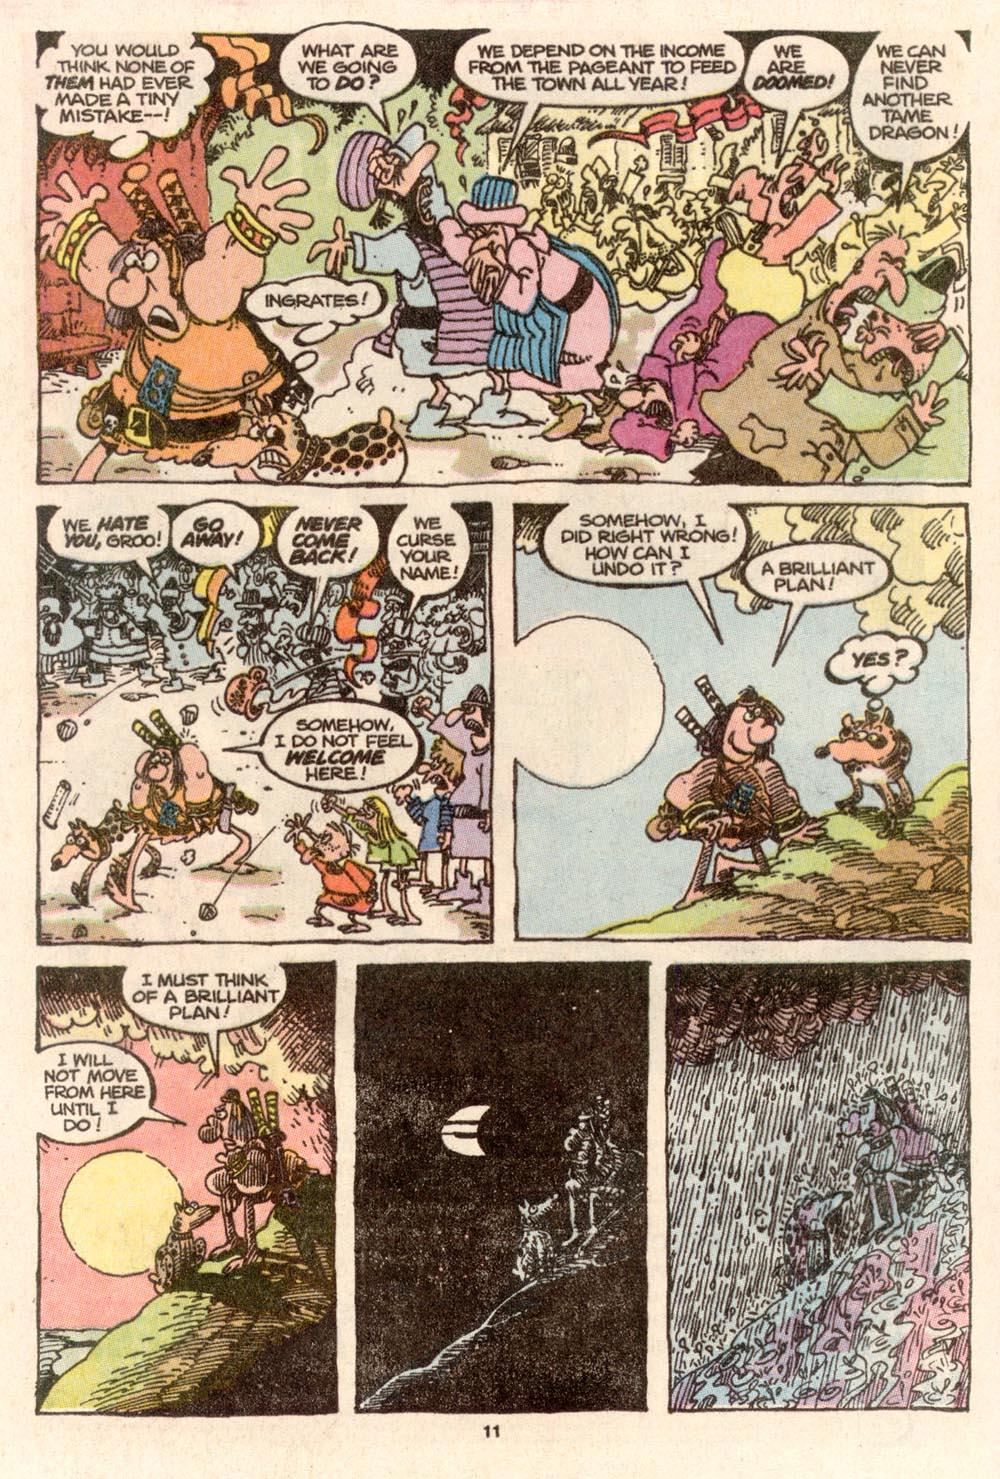 Read online Sergio Aragonés Groo the Wanderer comic -  Issue #67 - 8